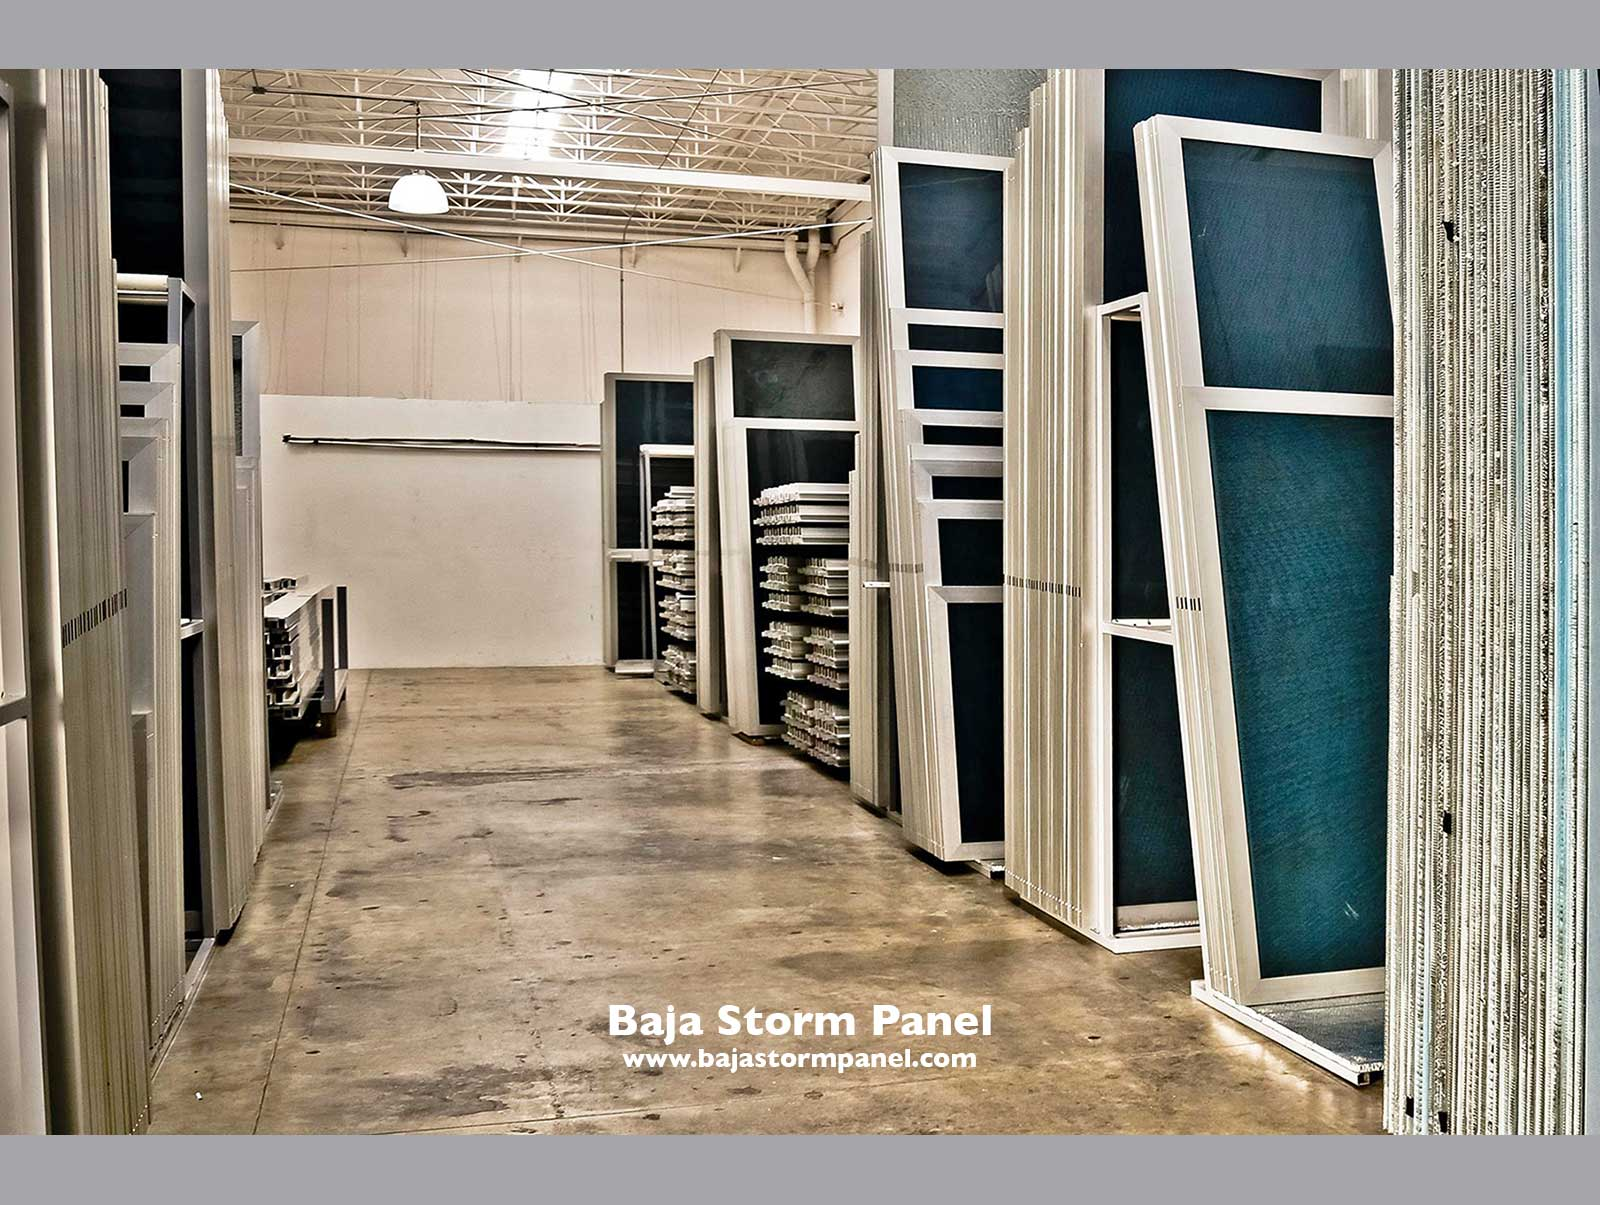 baja-storm-panel-warehouse-inventory-60357-1600-2